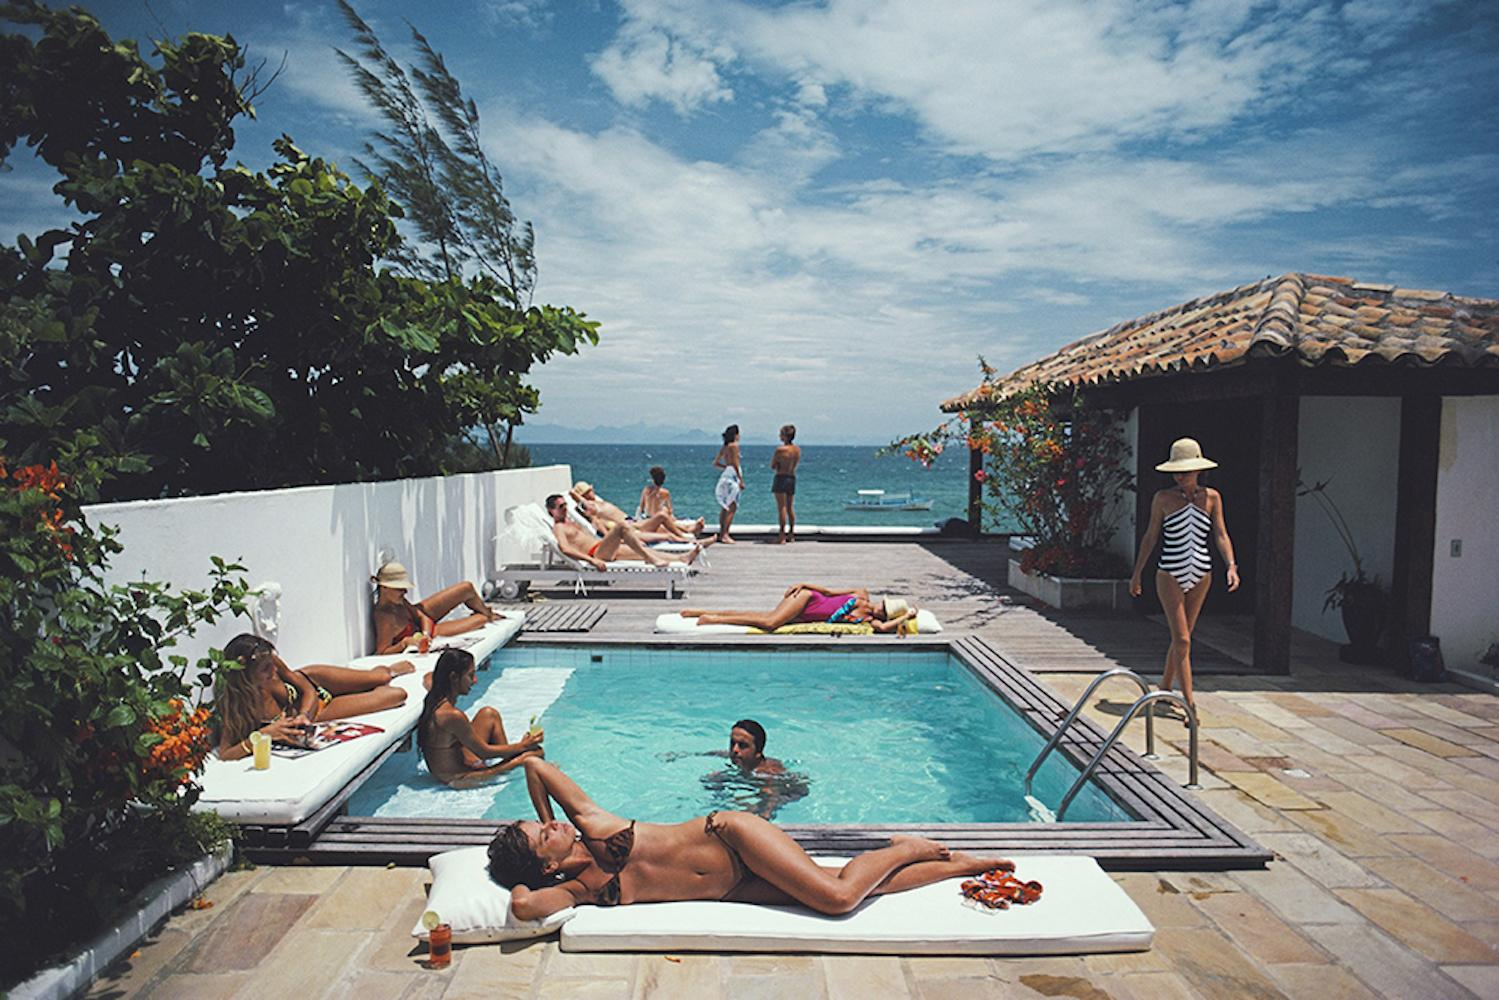 Buzios - Slim Aarons, 20th Century, Blue Skies, Swimming Pool, Tropical imagery